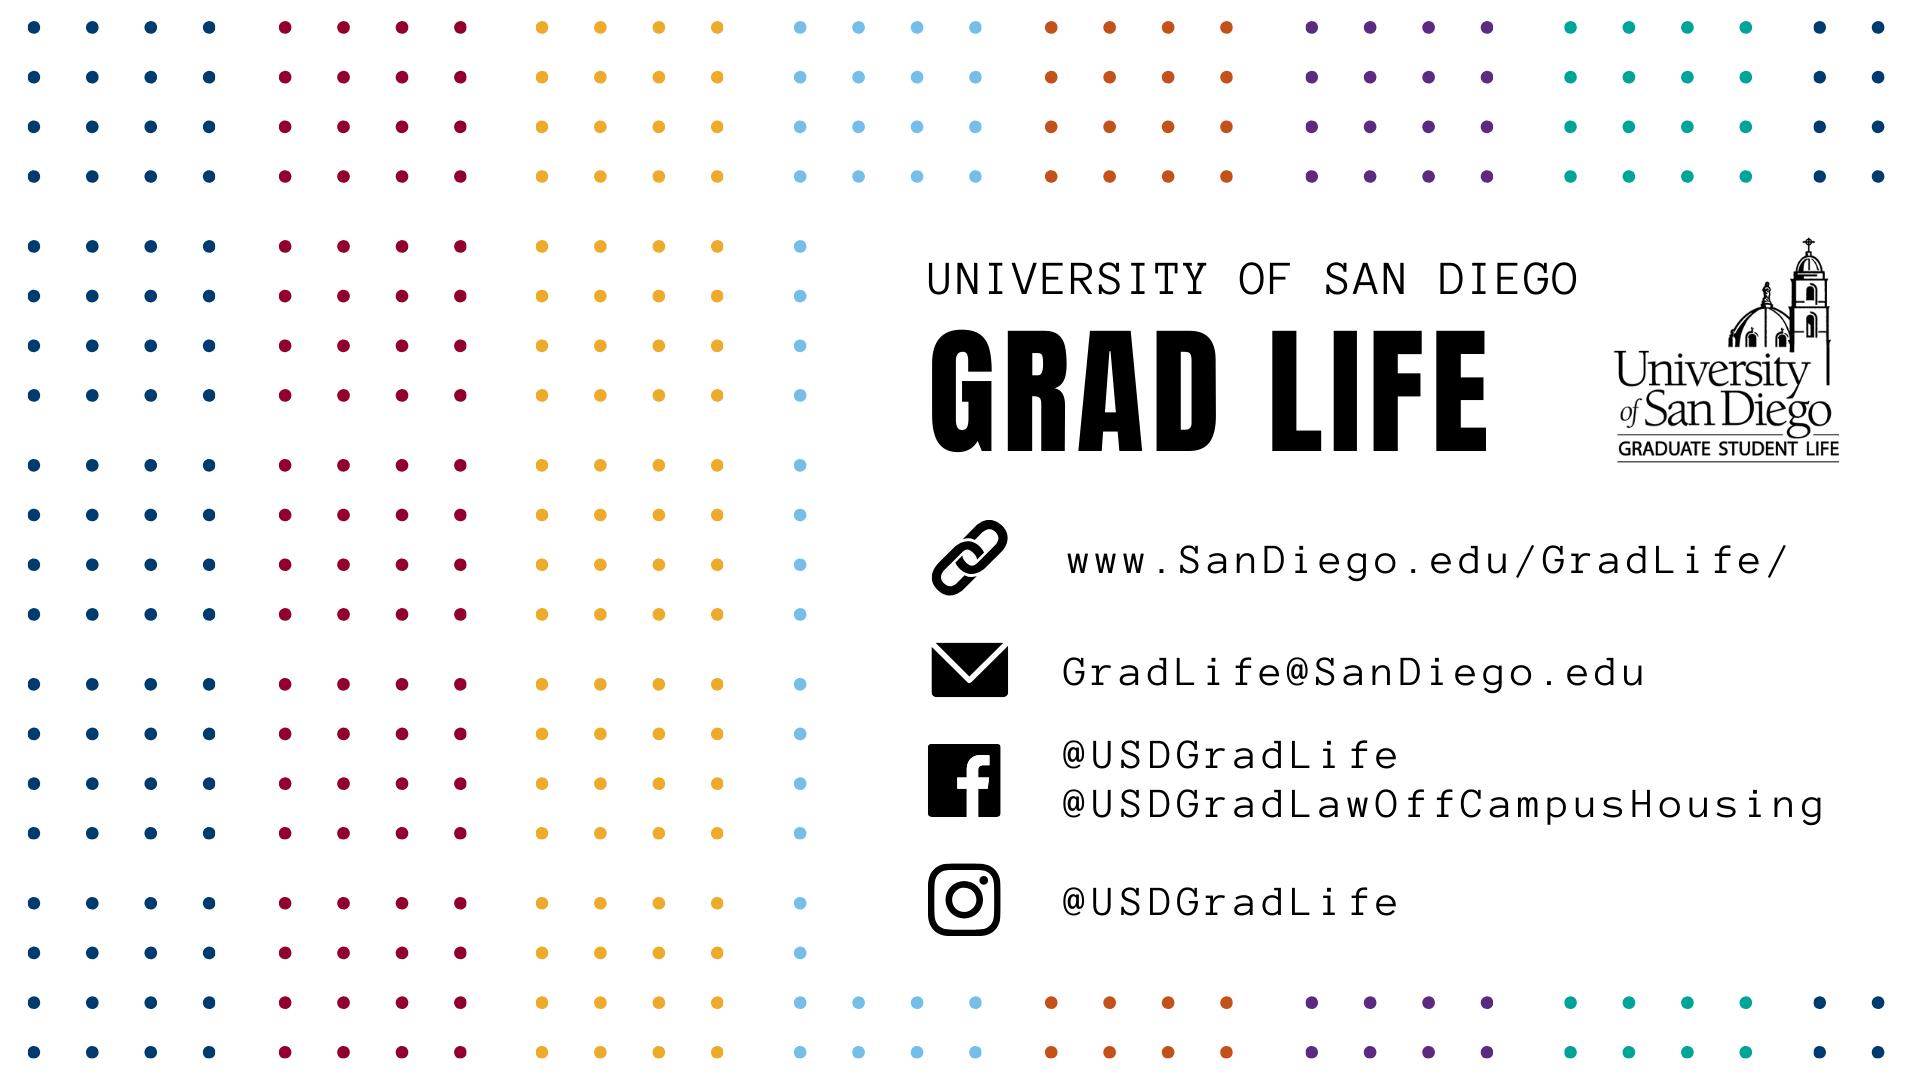 Contact us at gradlife@sandiego.edu